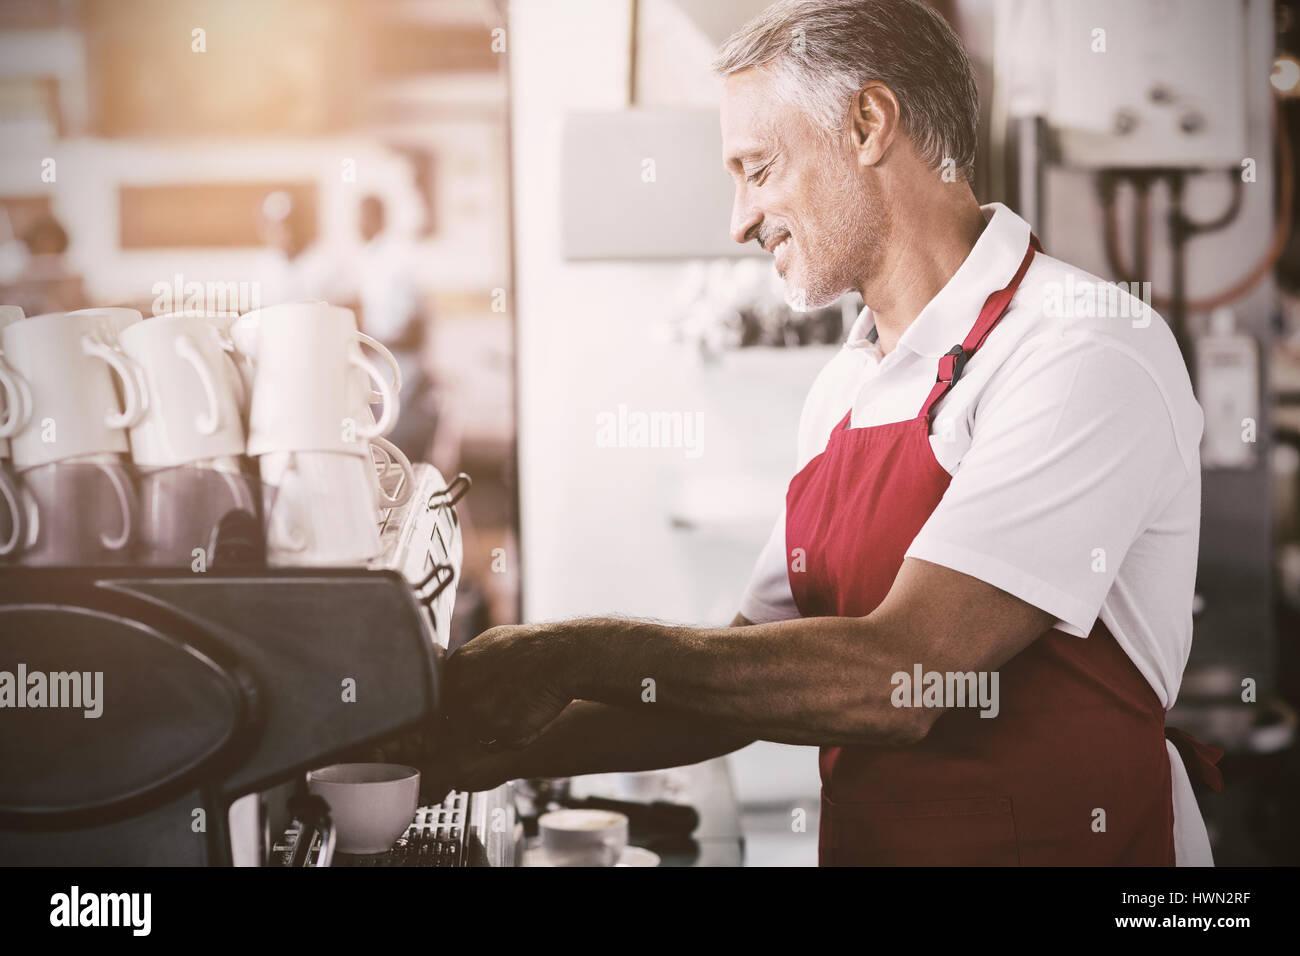 flare against happy barista using coffee machine - Stock Image